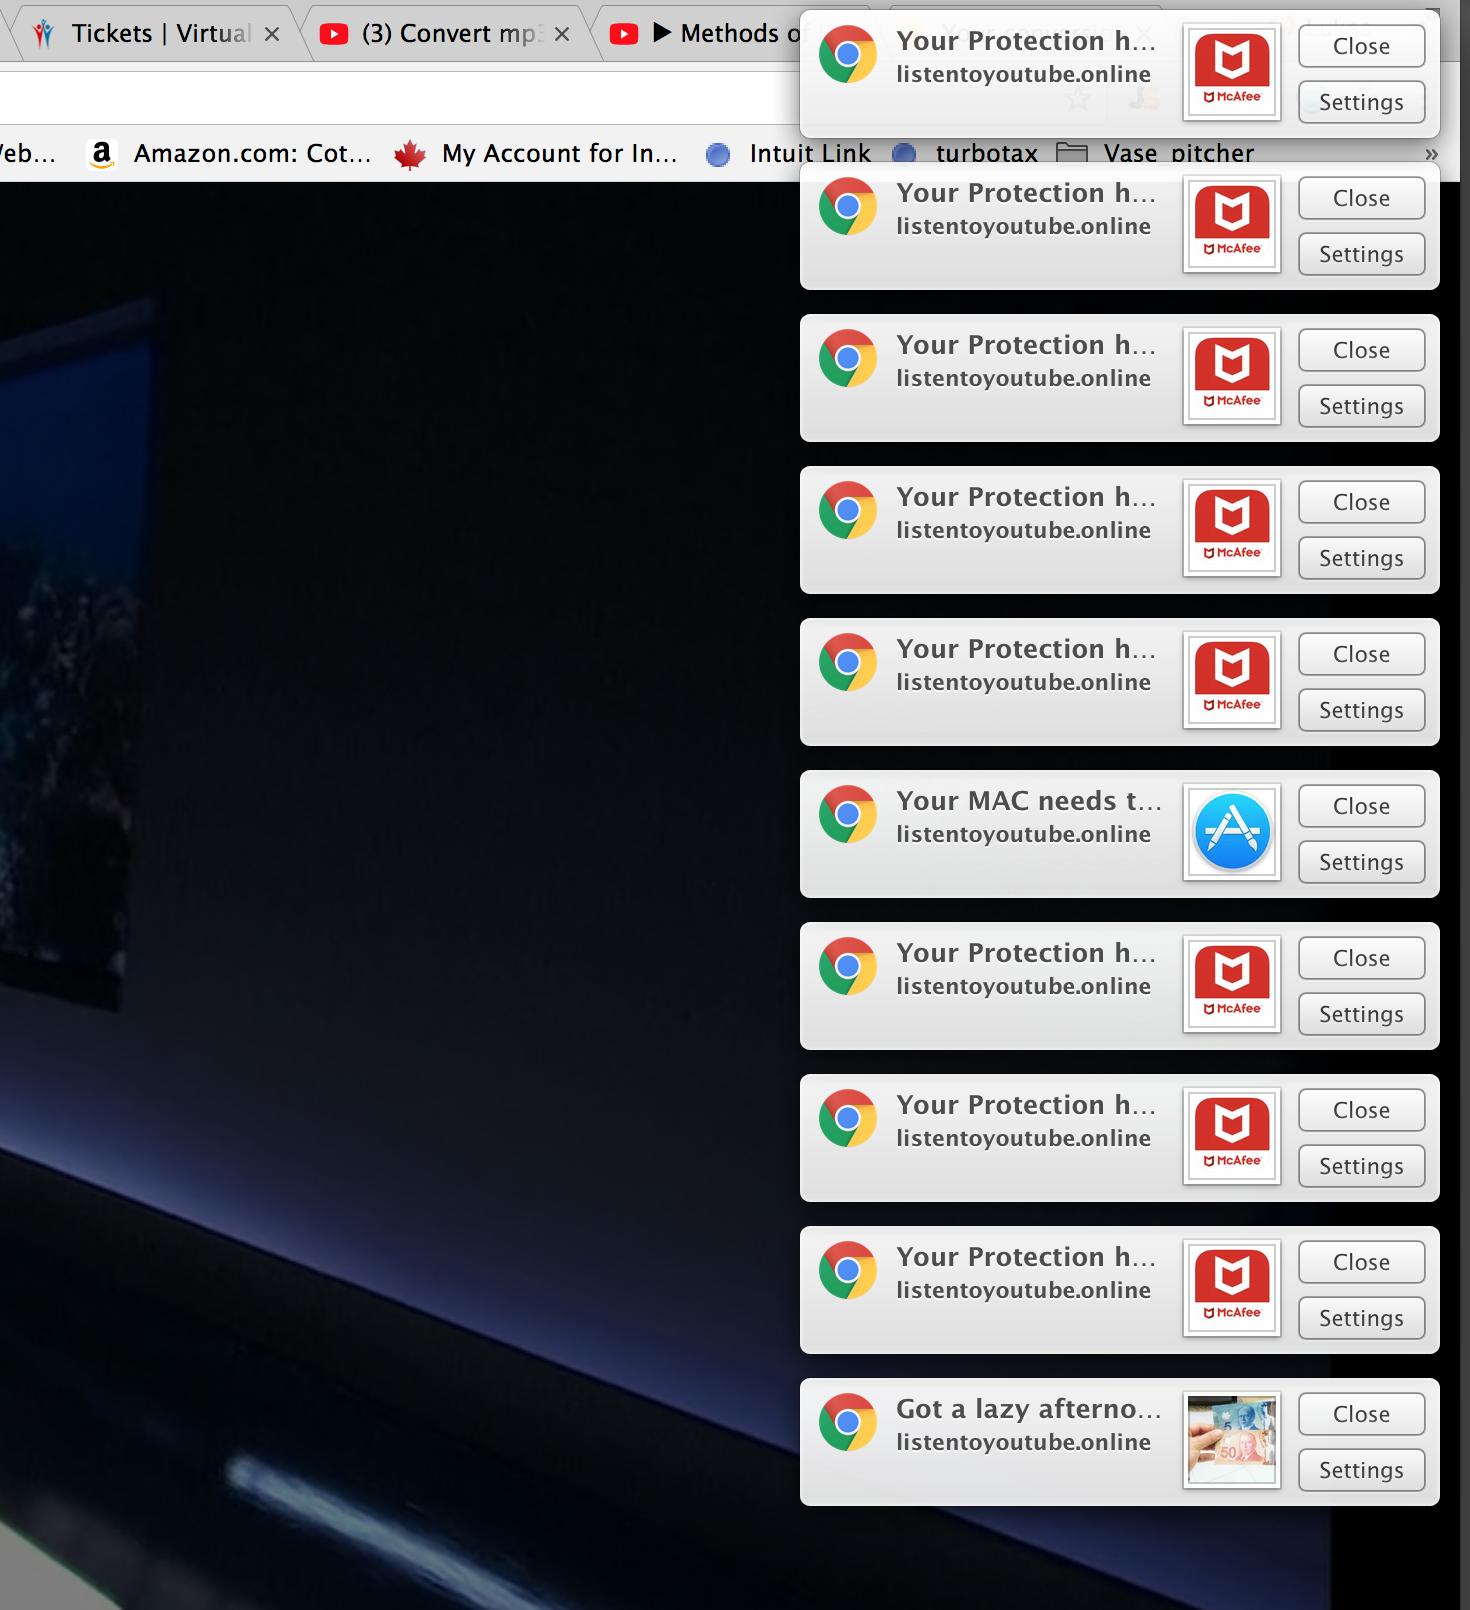 Chrome pop up notifications, how do I turn them off? - Google Chrome  Community